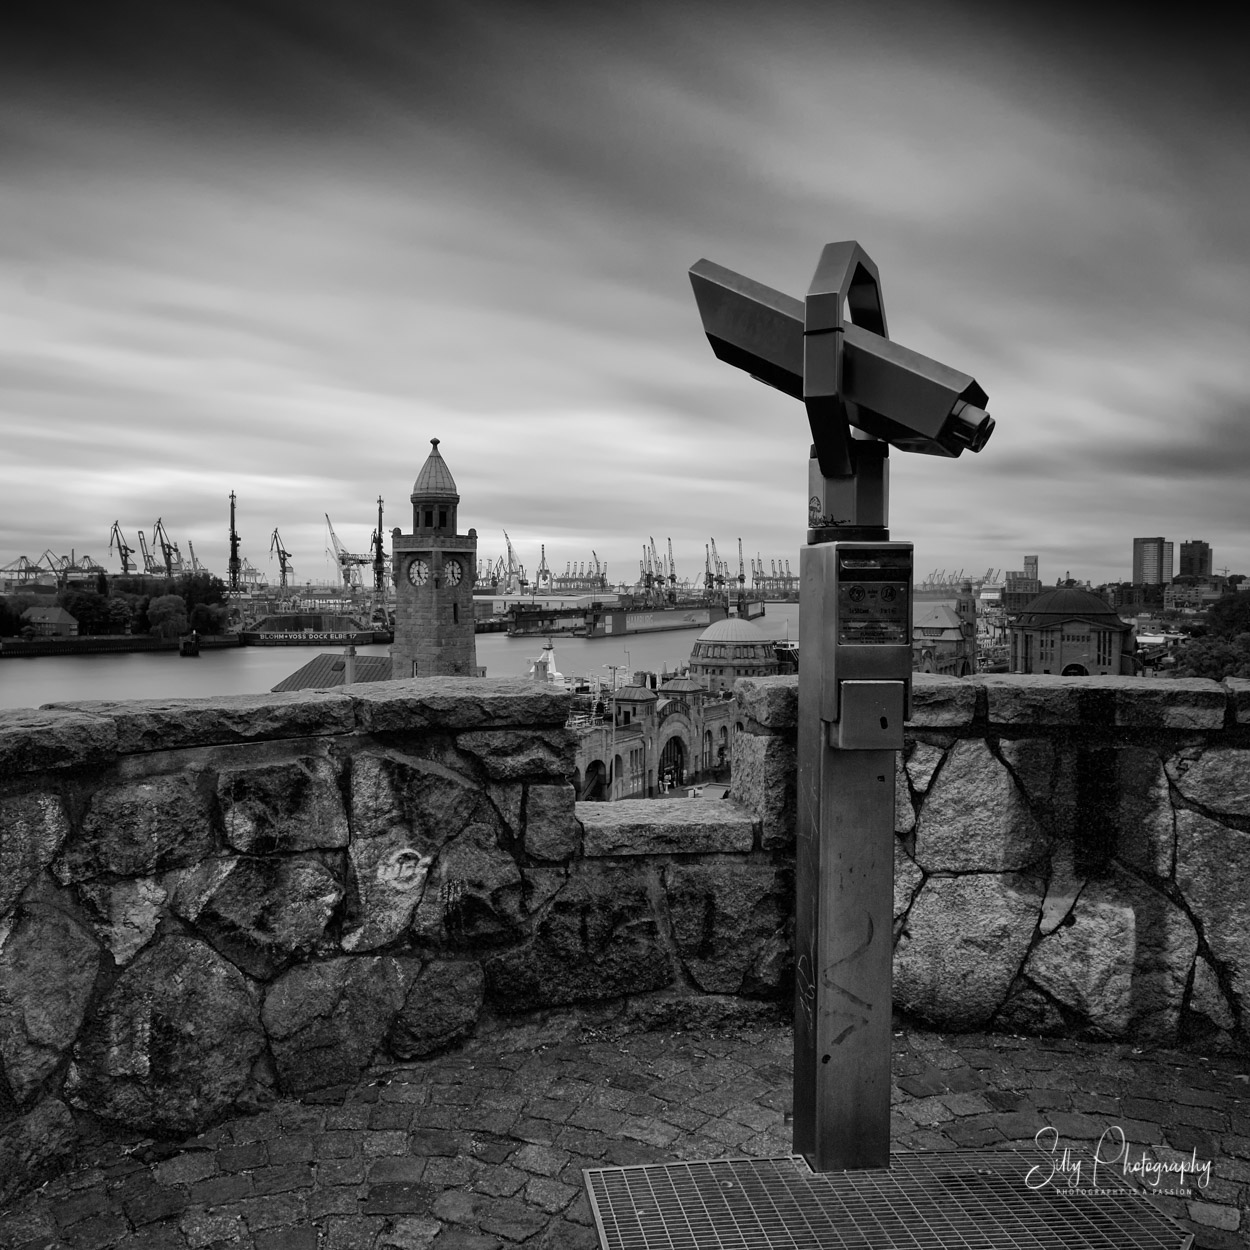 Hamburg / Hamburger Hafen / Landungsbrücken, Pegelturm, Dock Elbe 17, Blick vom Stintfang, 2015, © Silly Photography